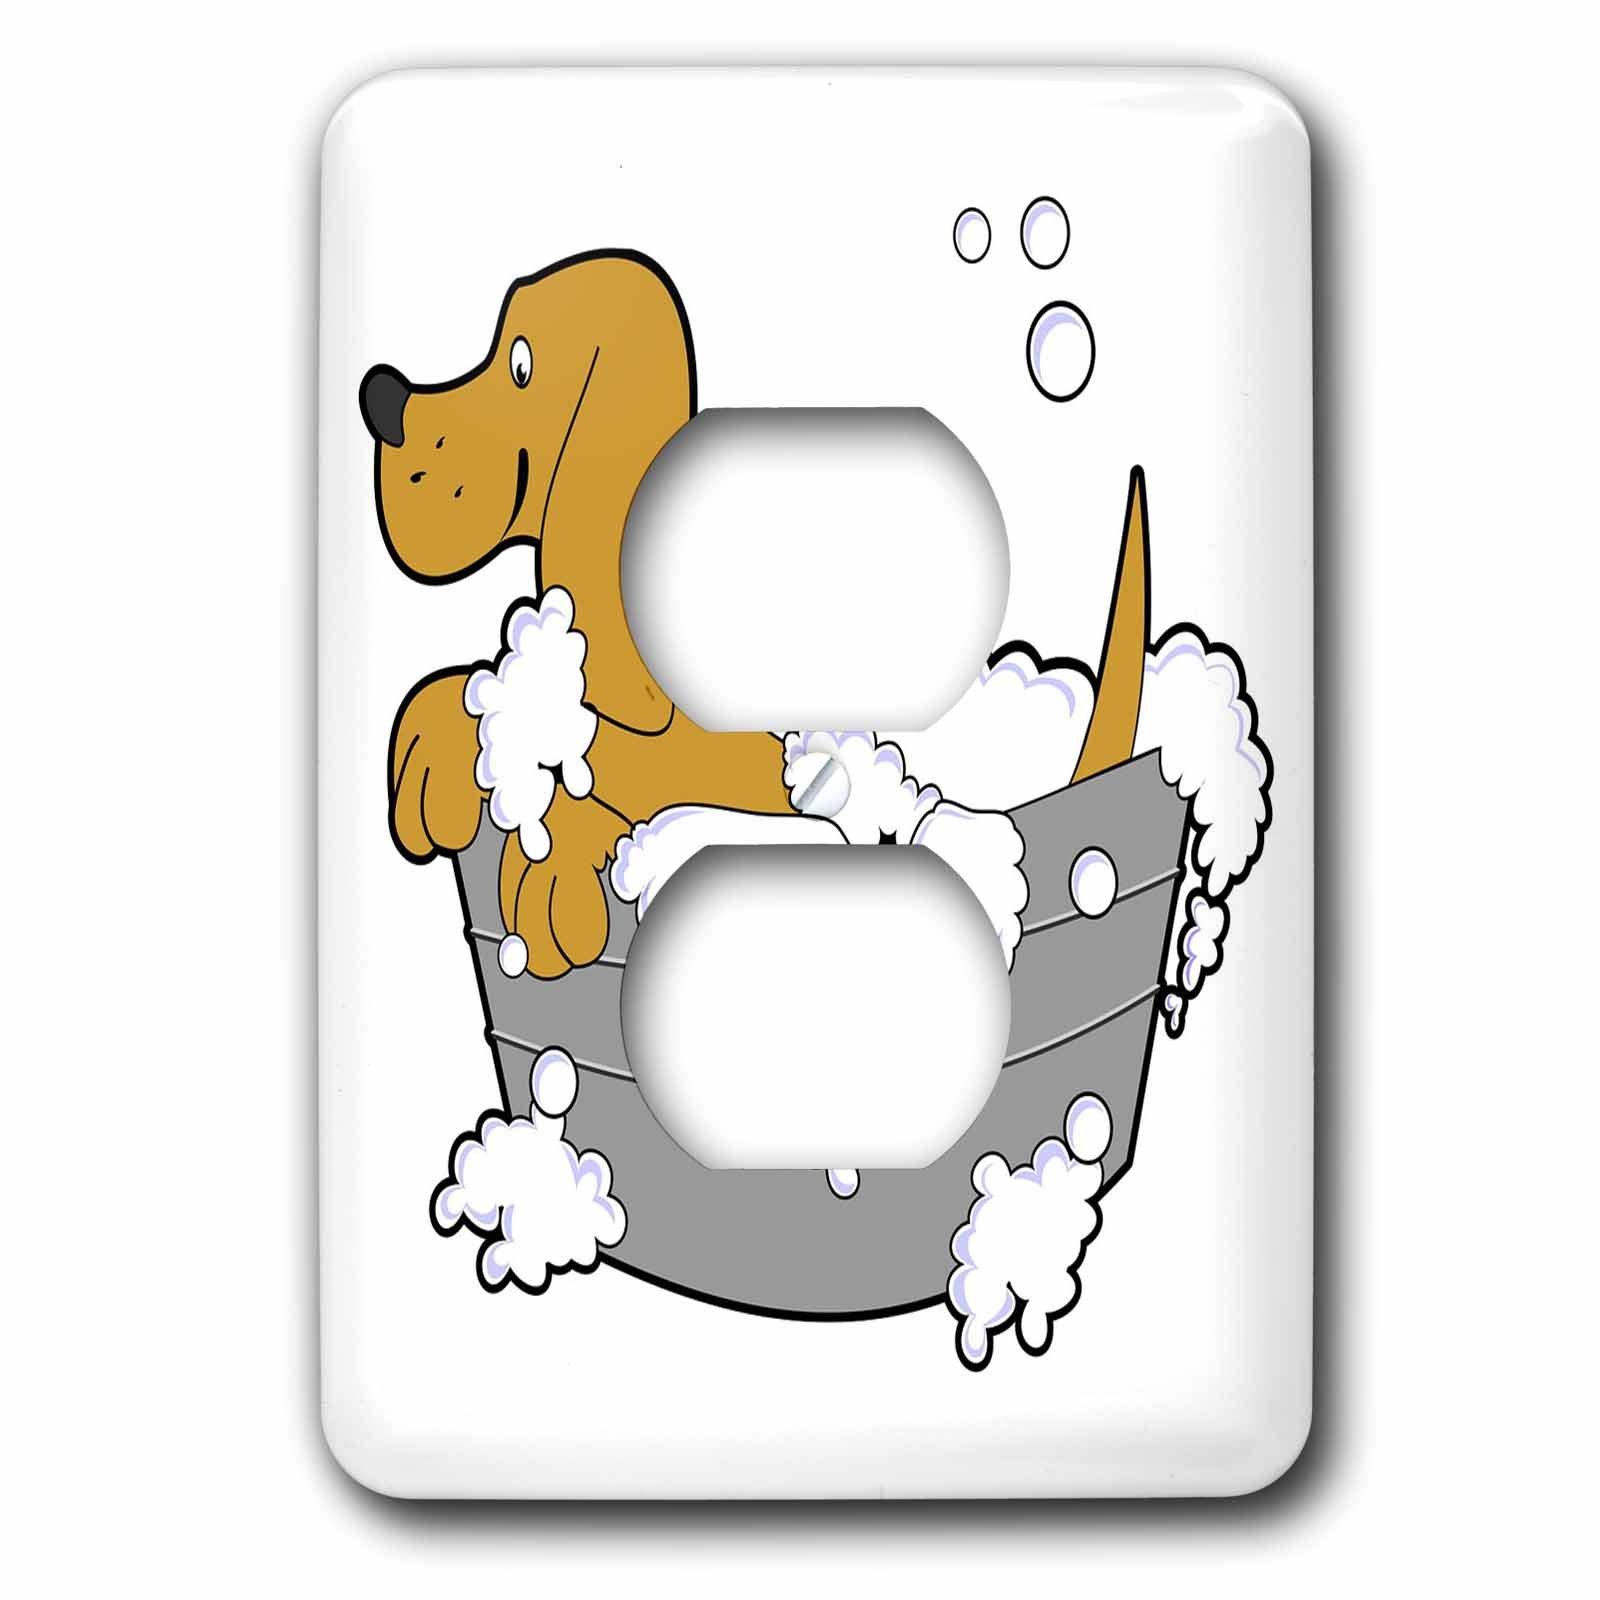 3D Rose lsp_251958_6 Doggy in Bathtub. Bubbles. Kids Décor. Cute Image. 2 Plug Outlet Cover